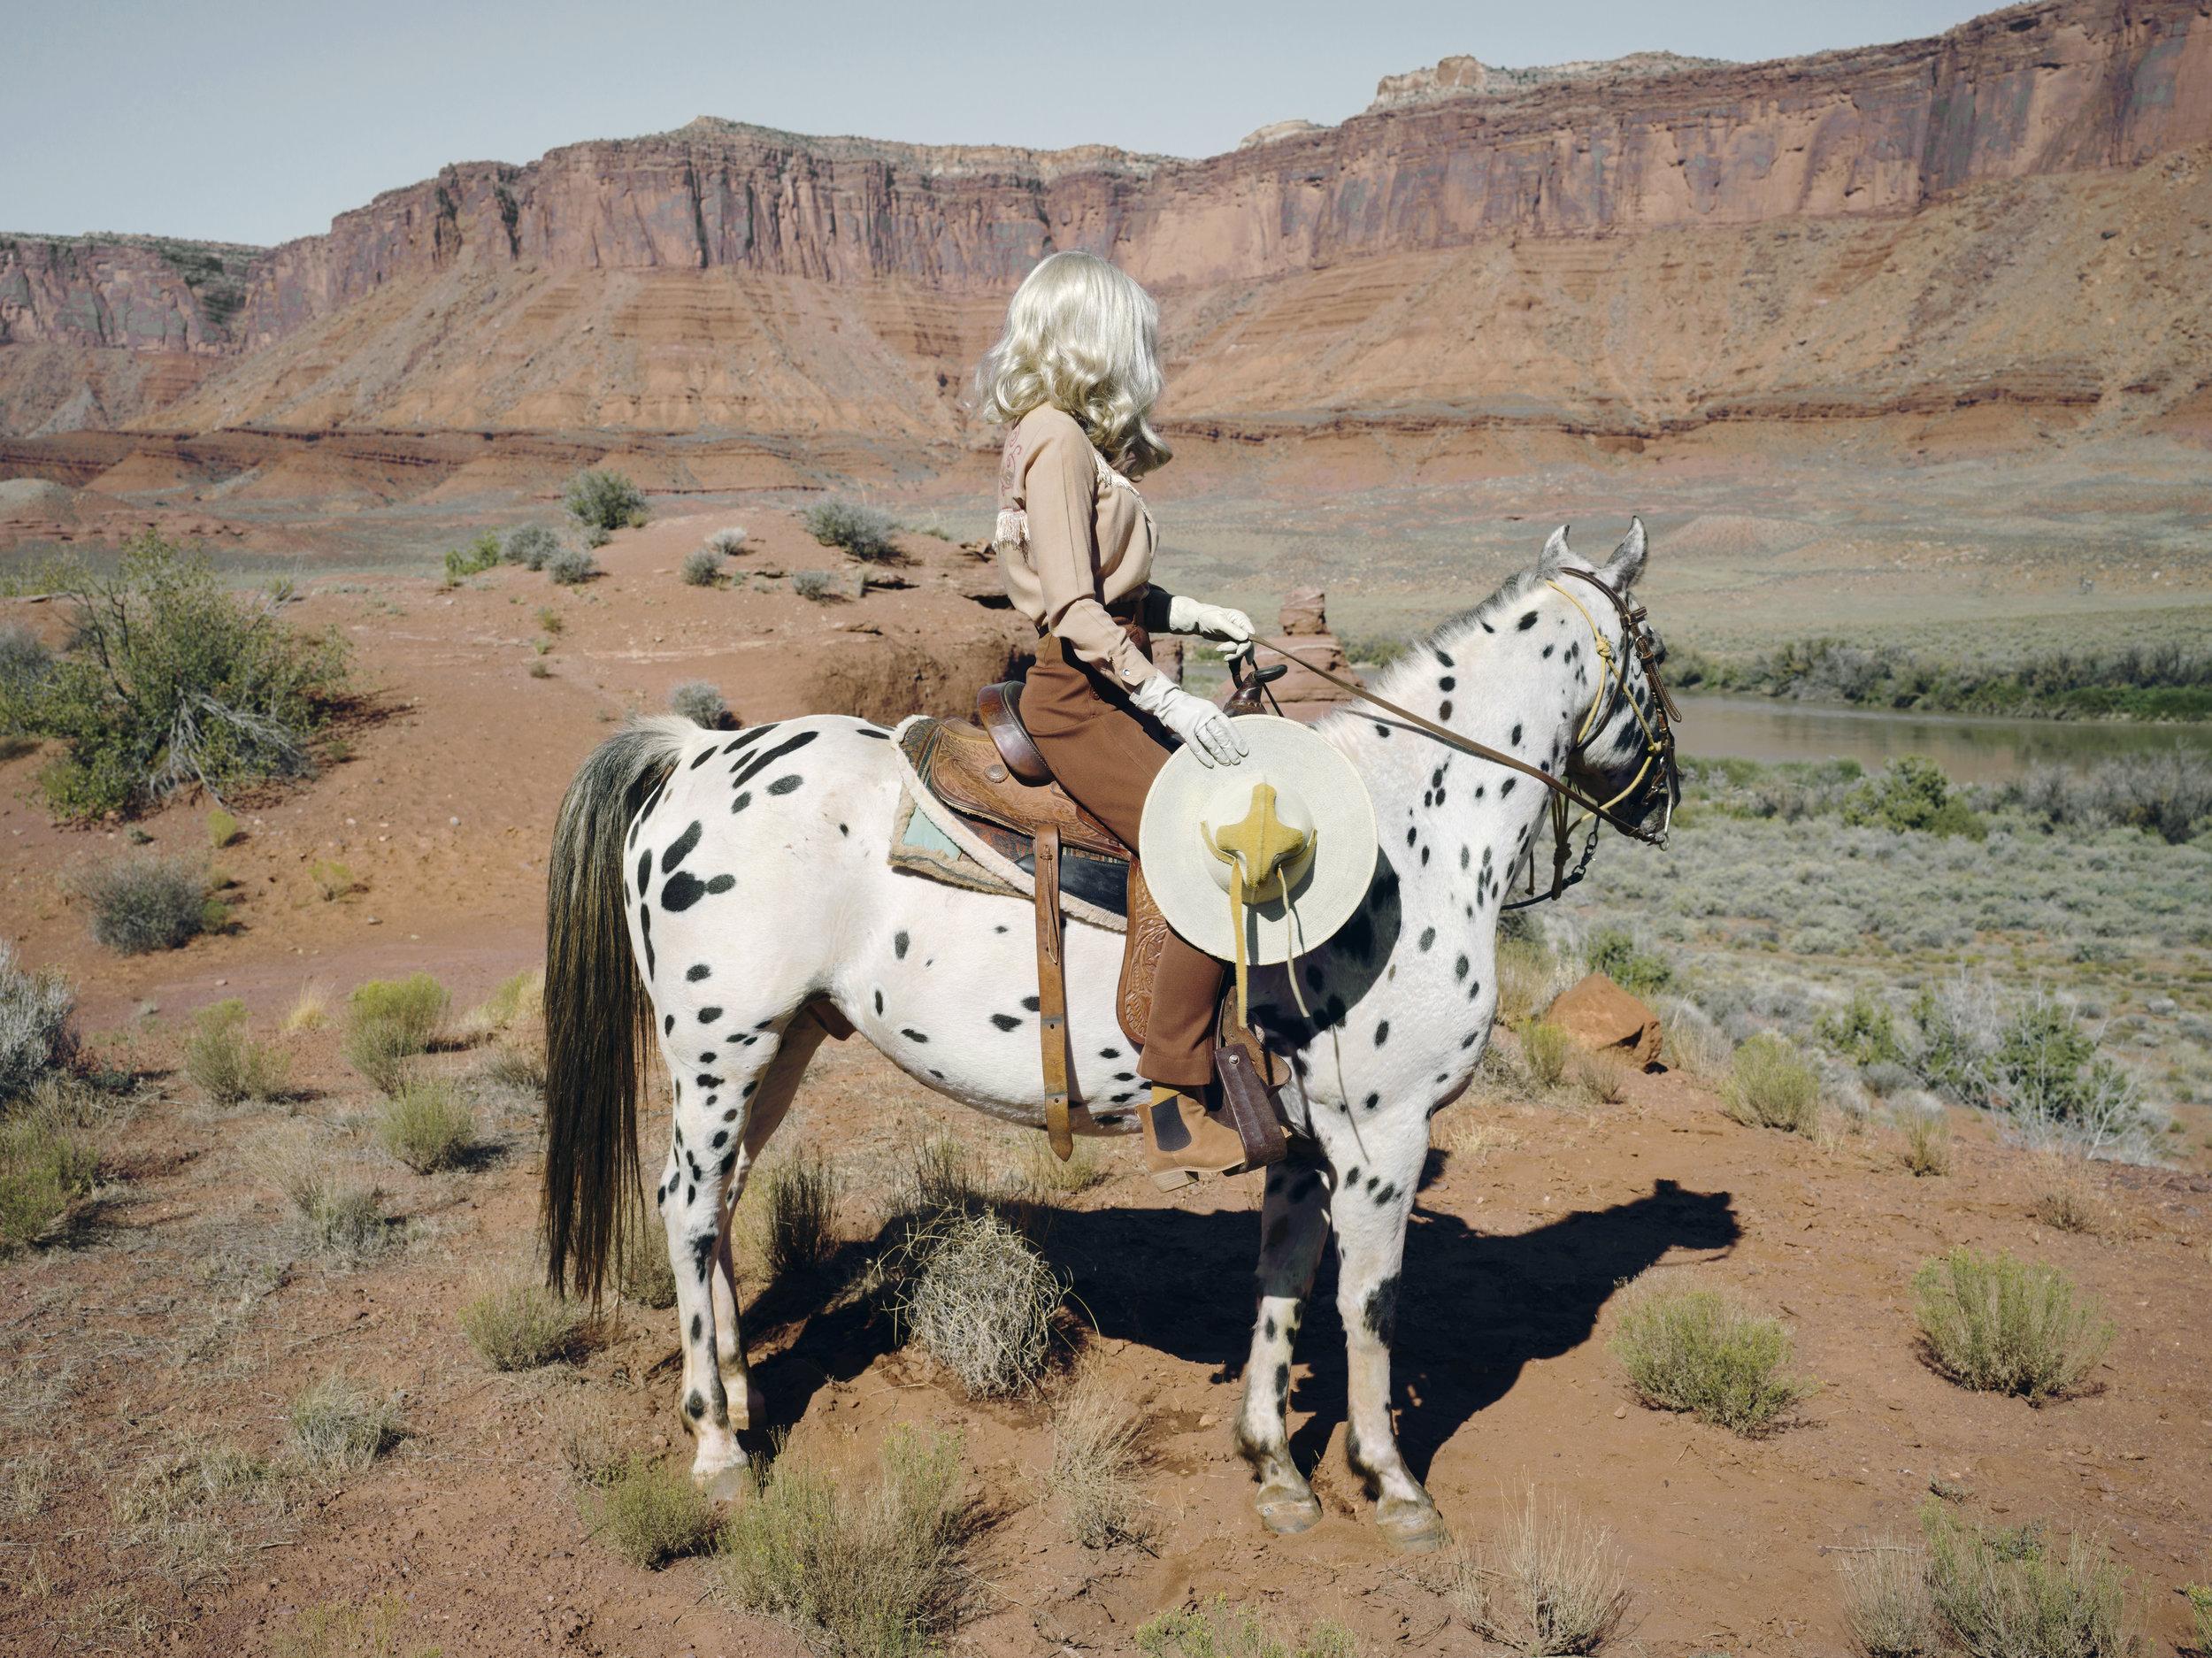 The Imaginary Cowboy, 2016 © Anja Niemi. Courtesy of The Ravestijn Gallery.